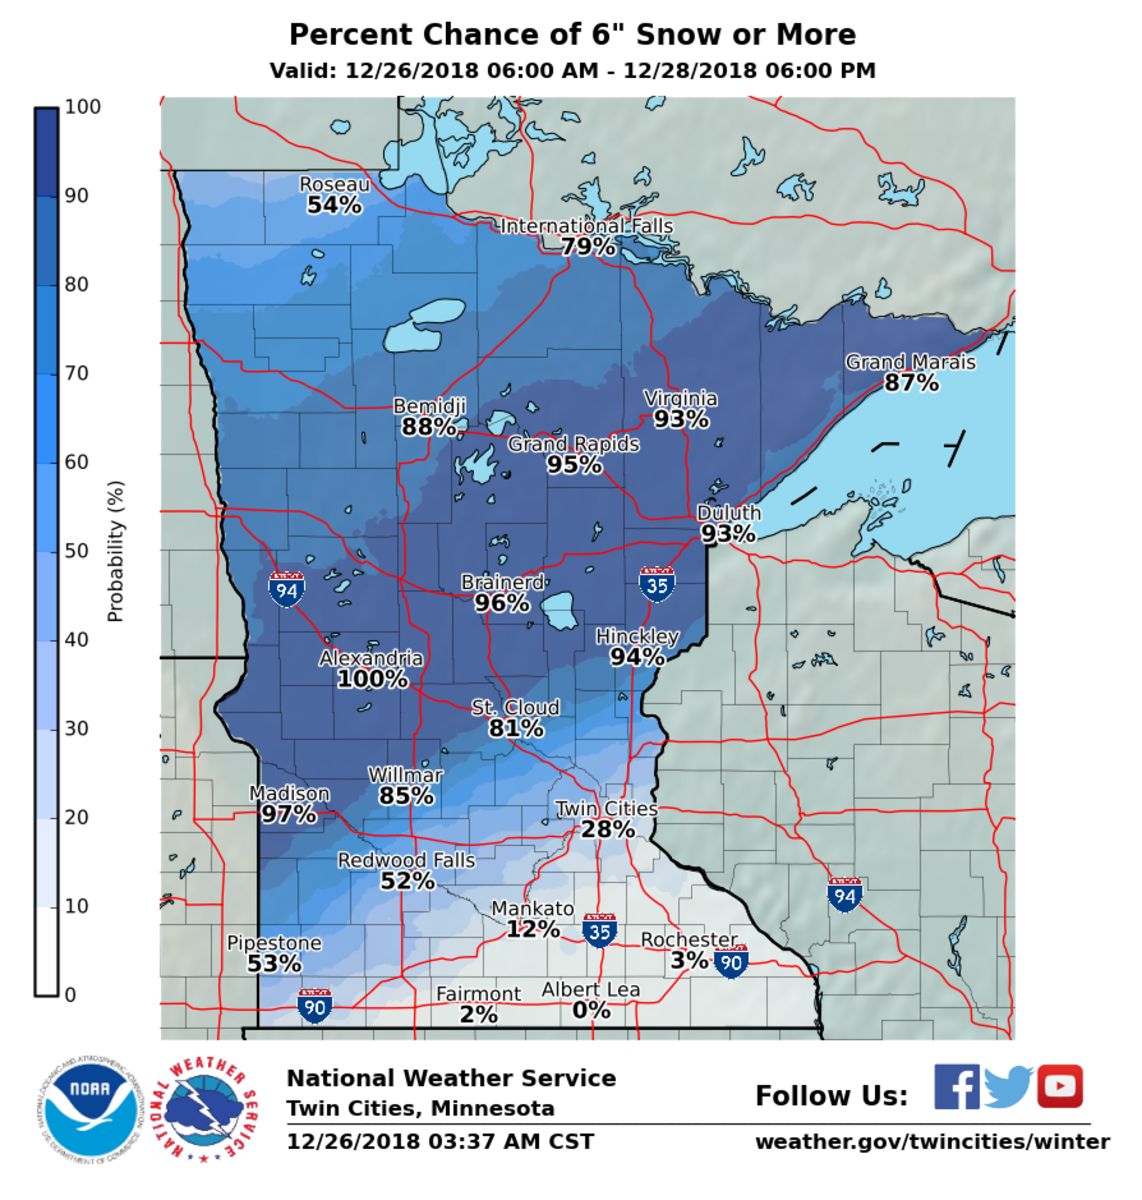 snowProbGE06_Minnesota